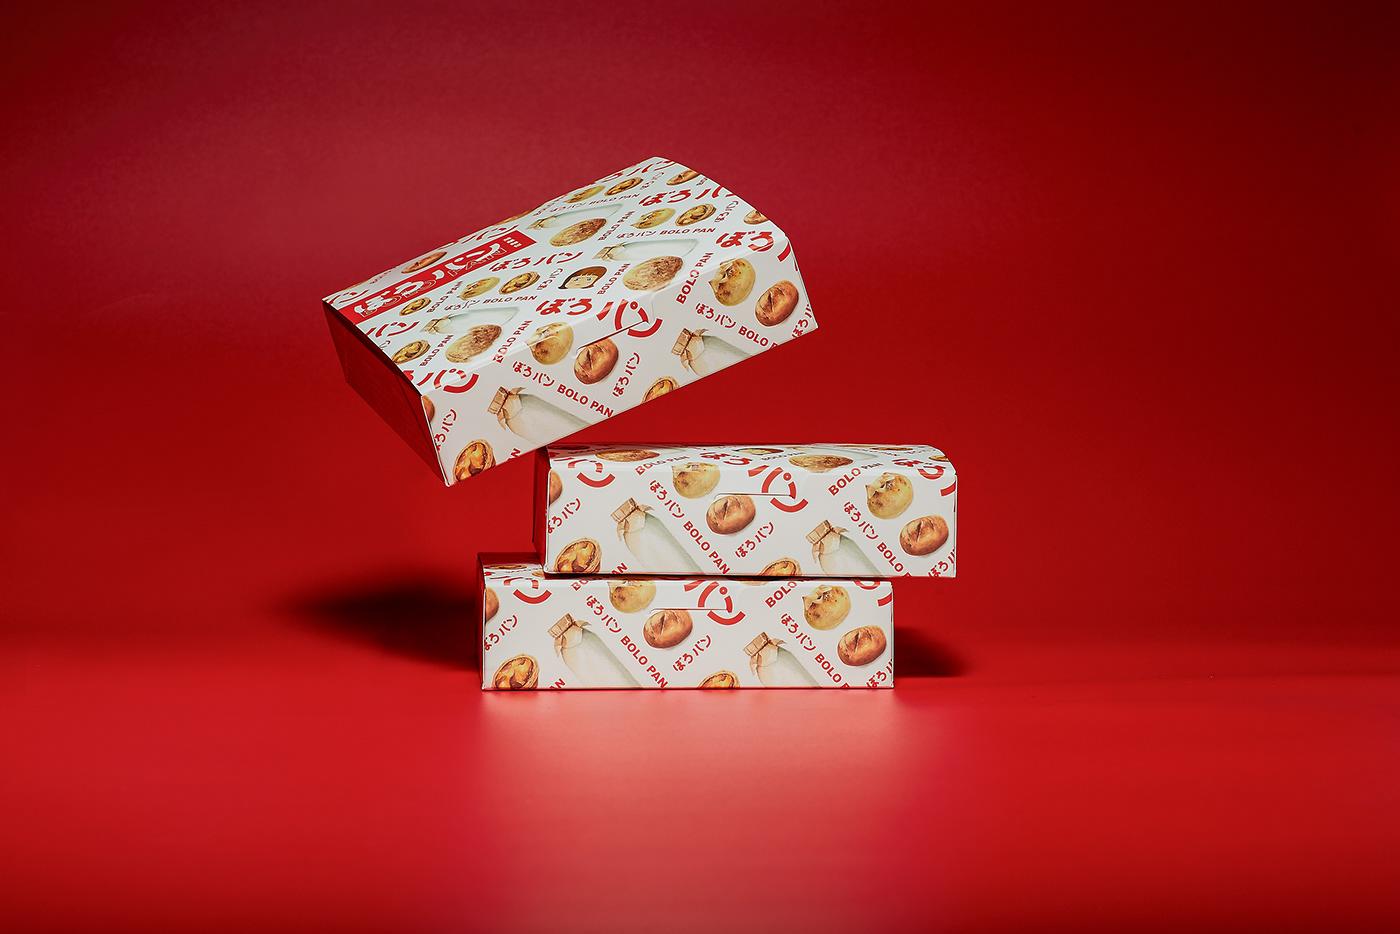 菠蘿麵包 BOLOPAN CIS Packaging taiwan bakery bread